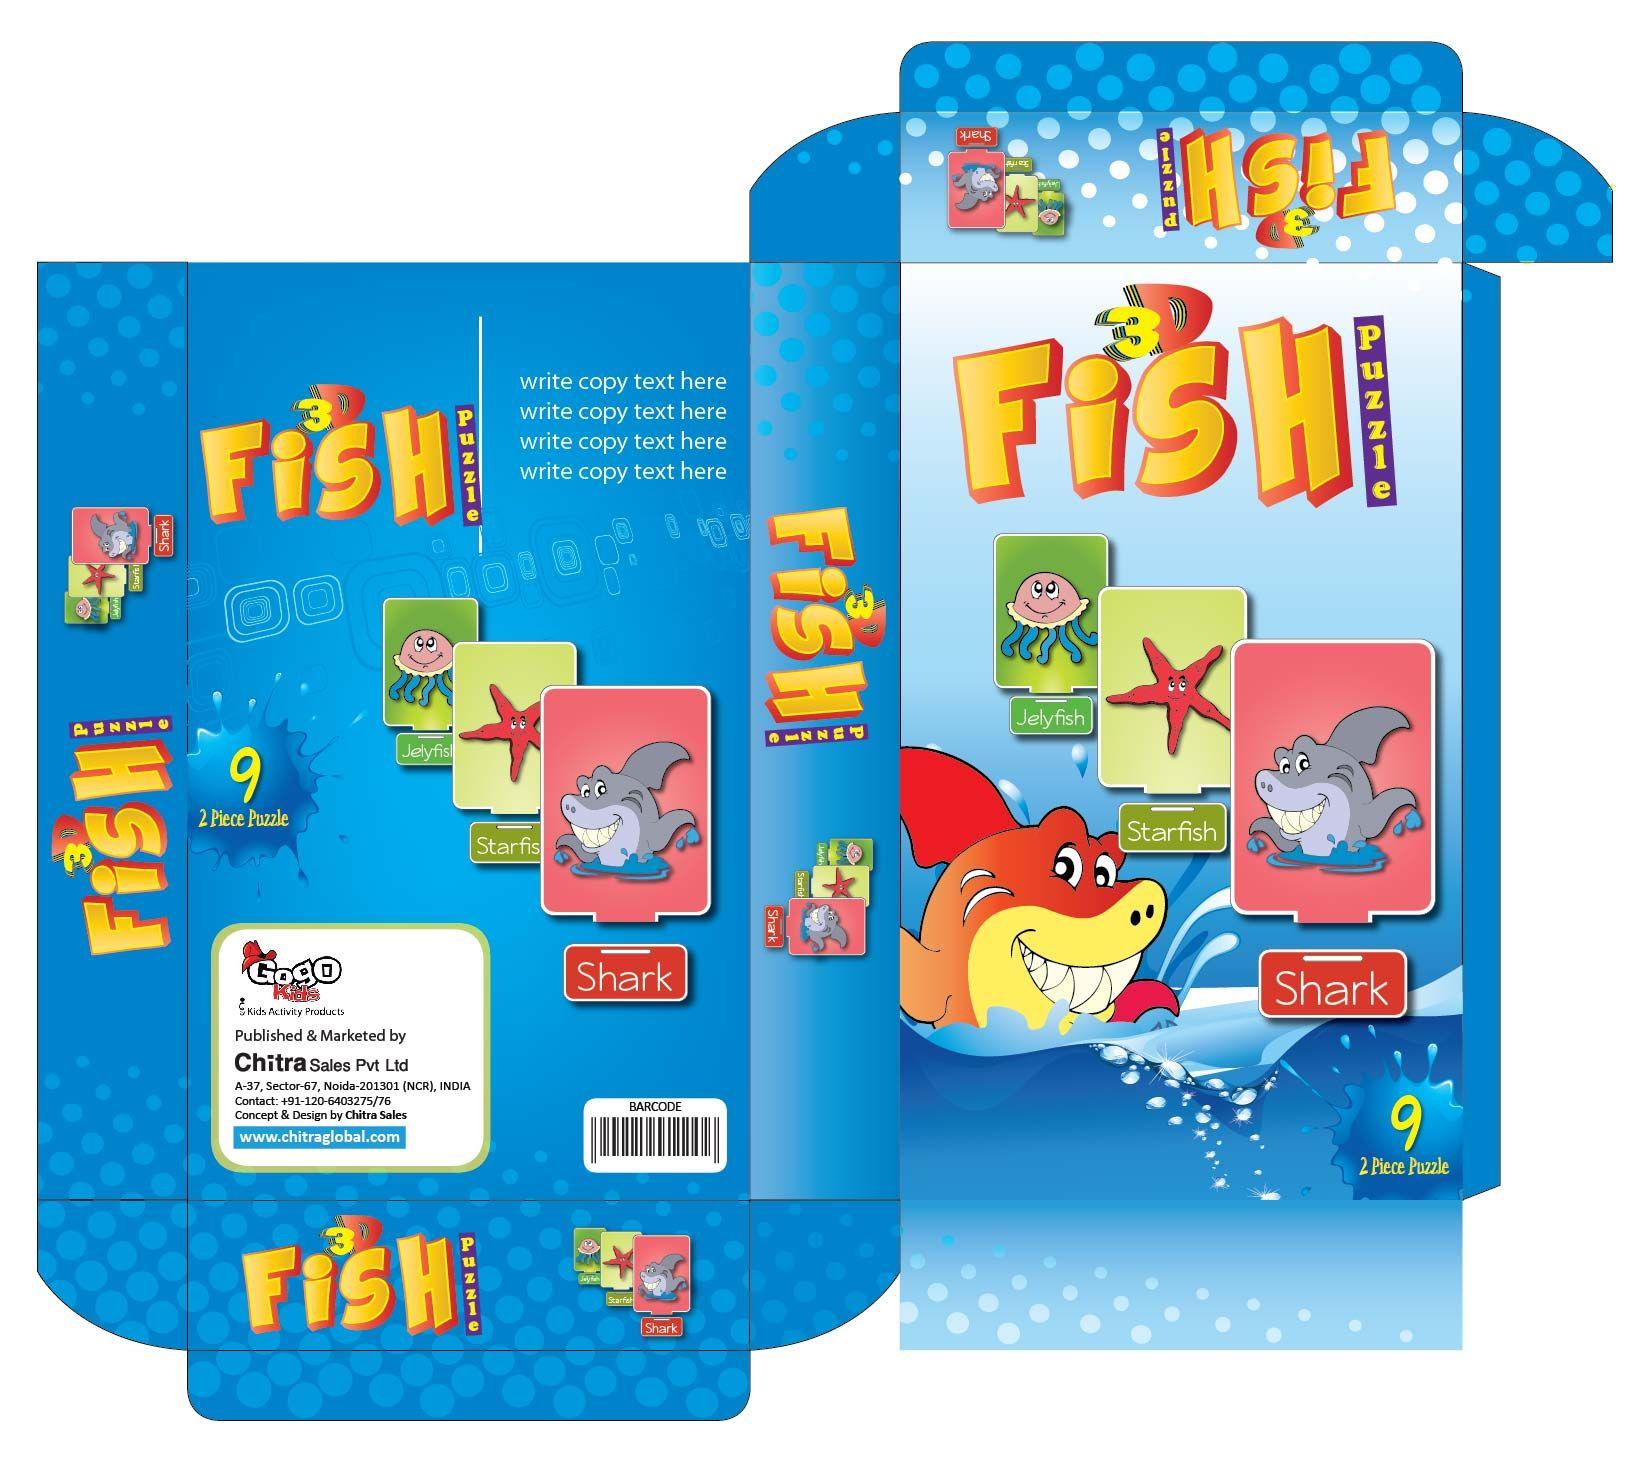 Go Fish Card Game Box Dollhouse Toys American Girl Doll Printables Toys